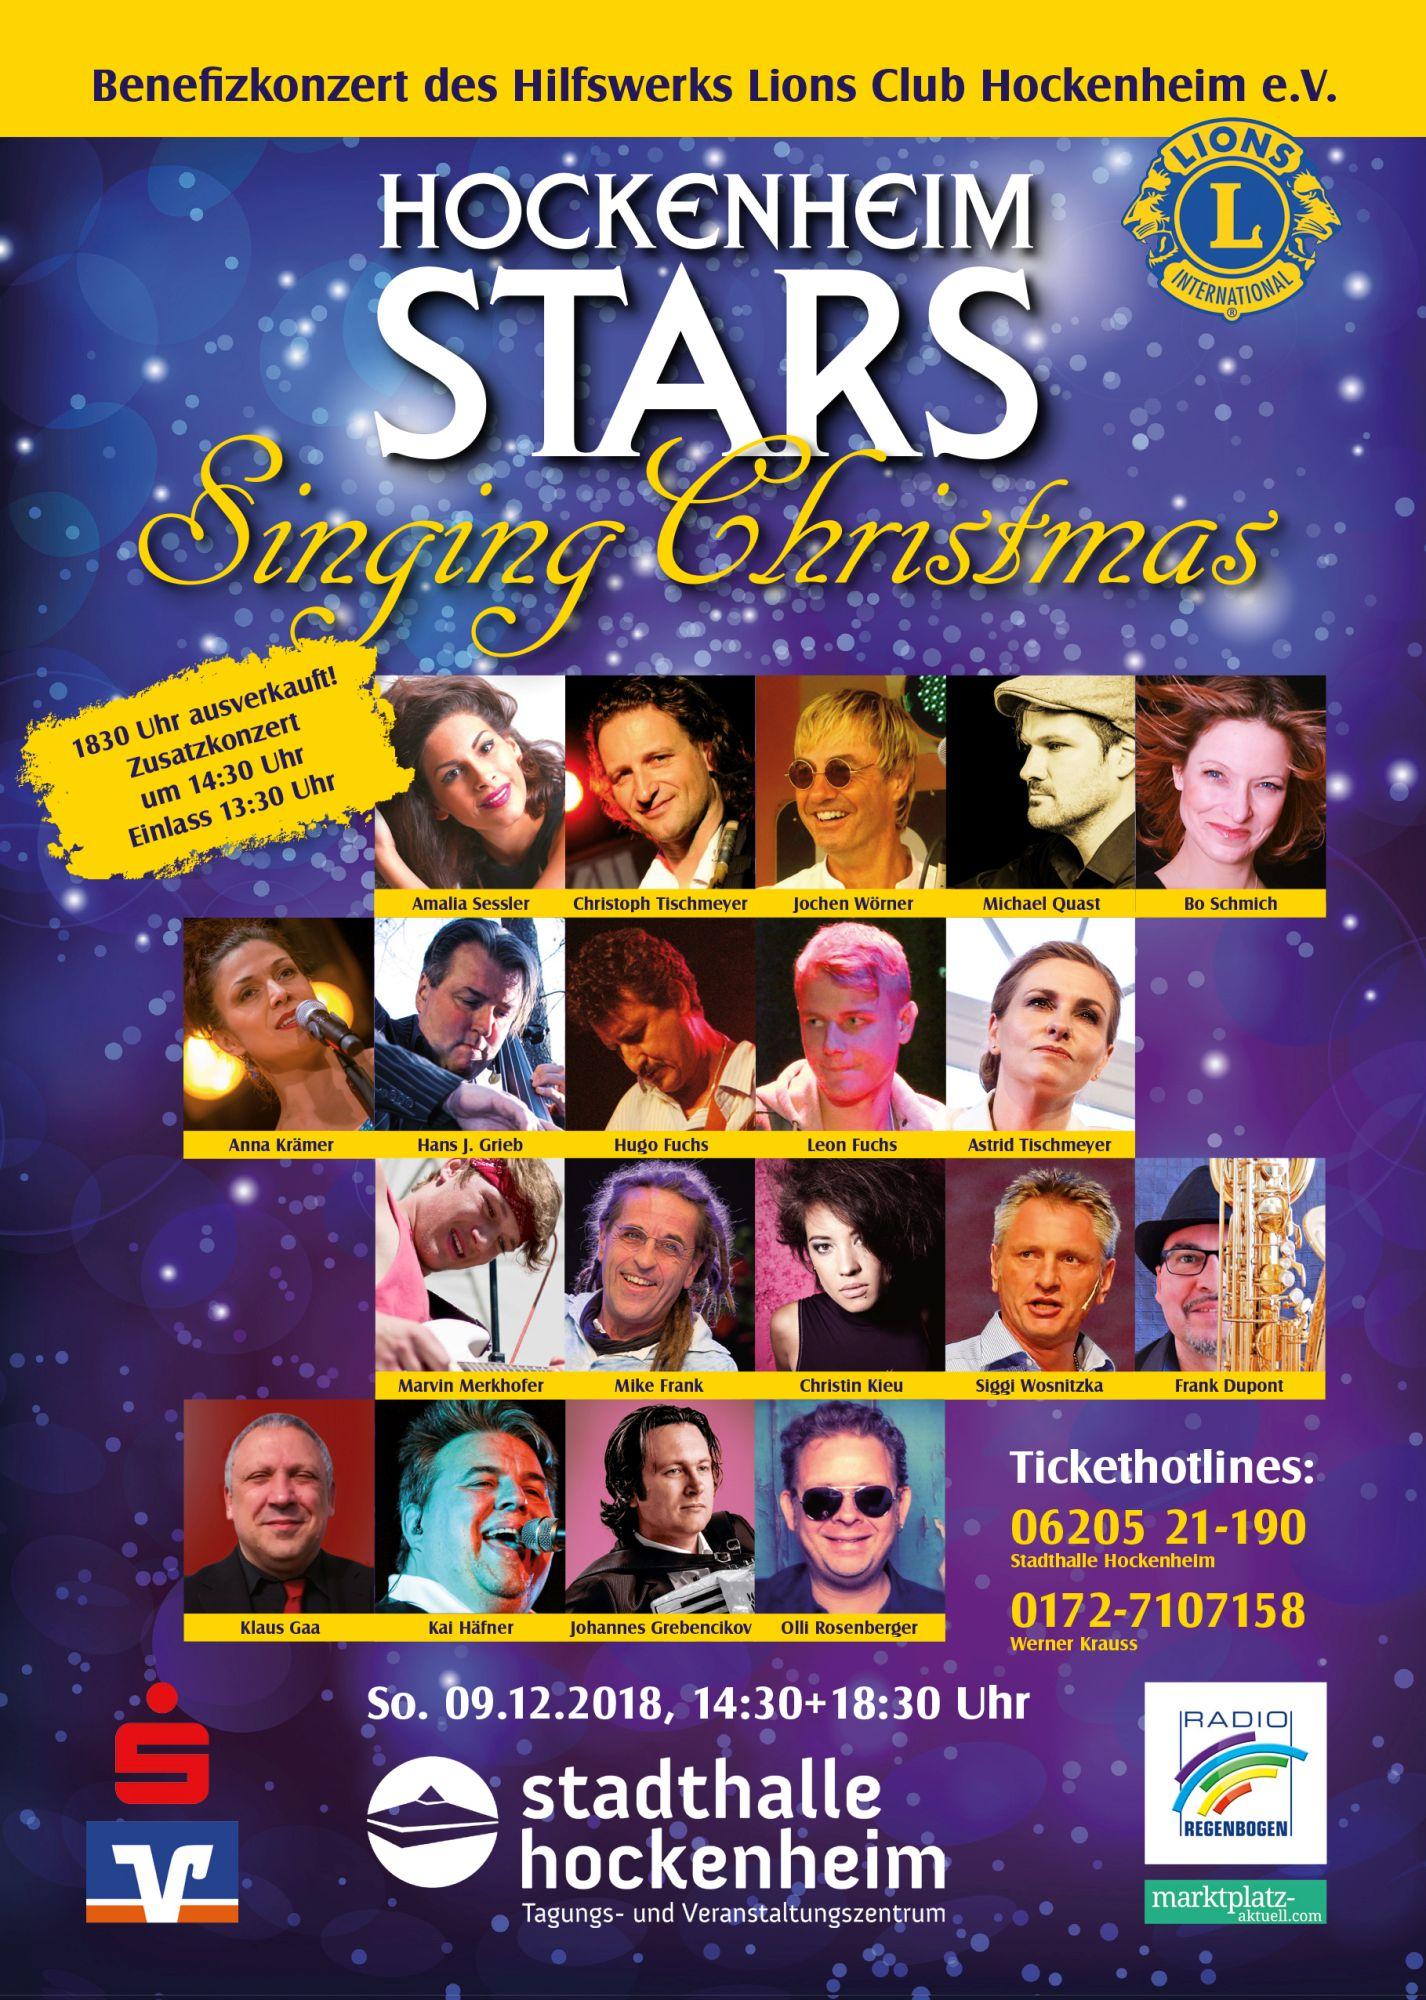 Hockenheim-Stars-Flyer.jpg